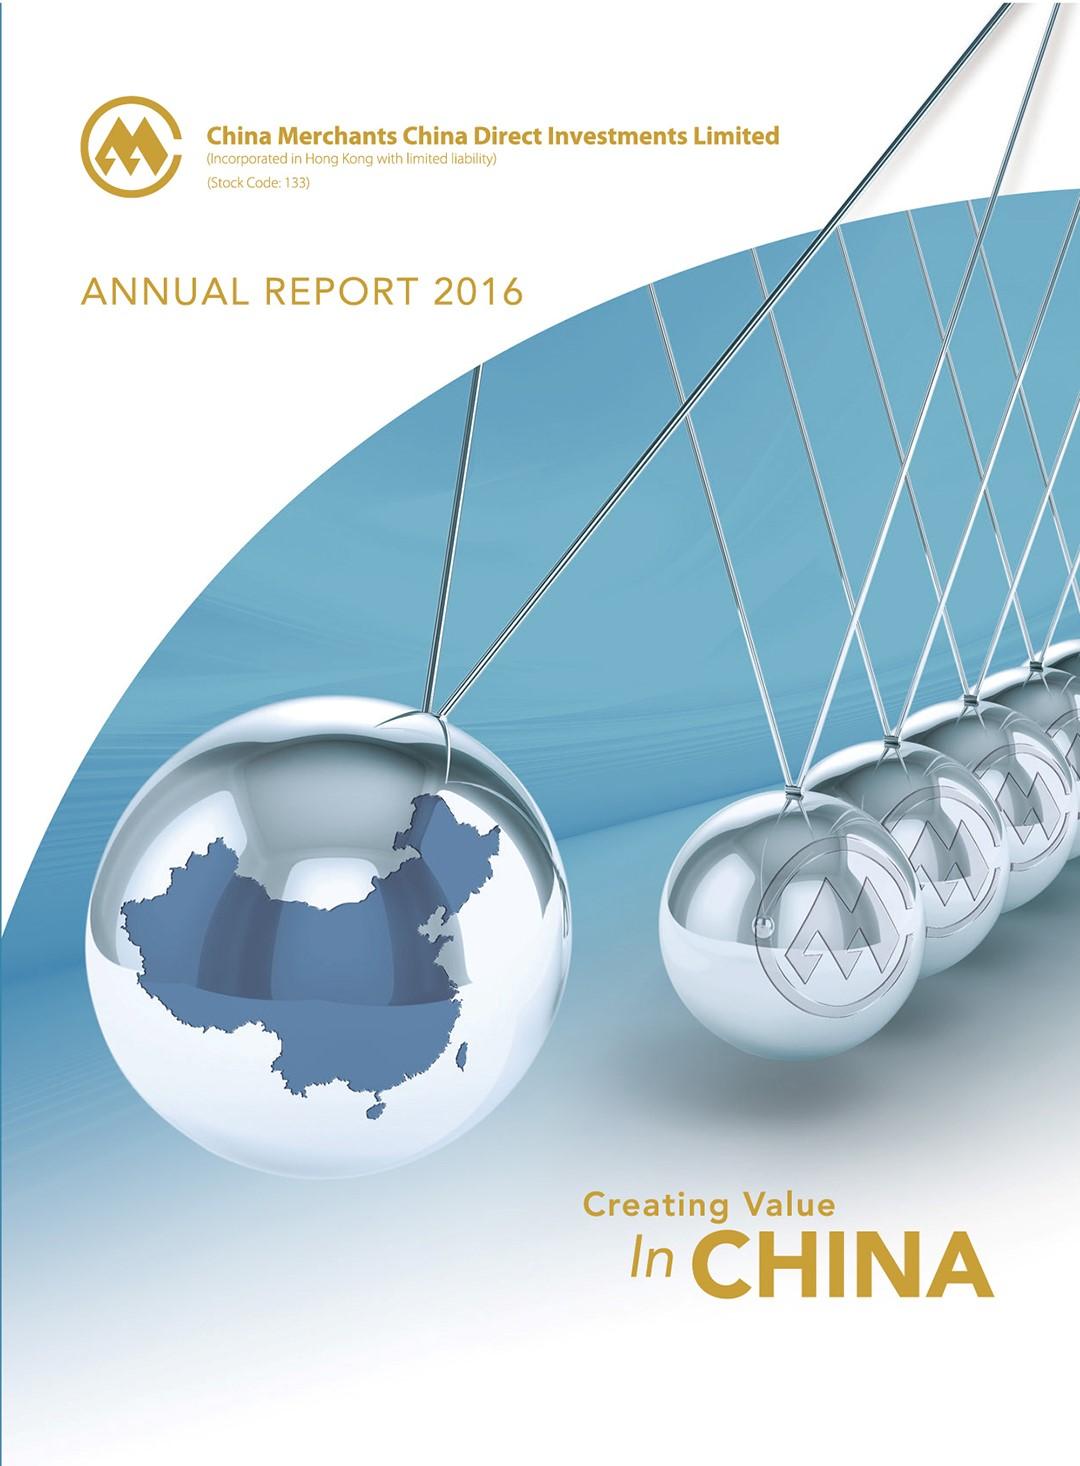 China Merchants China Direct Investments Limited